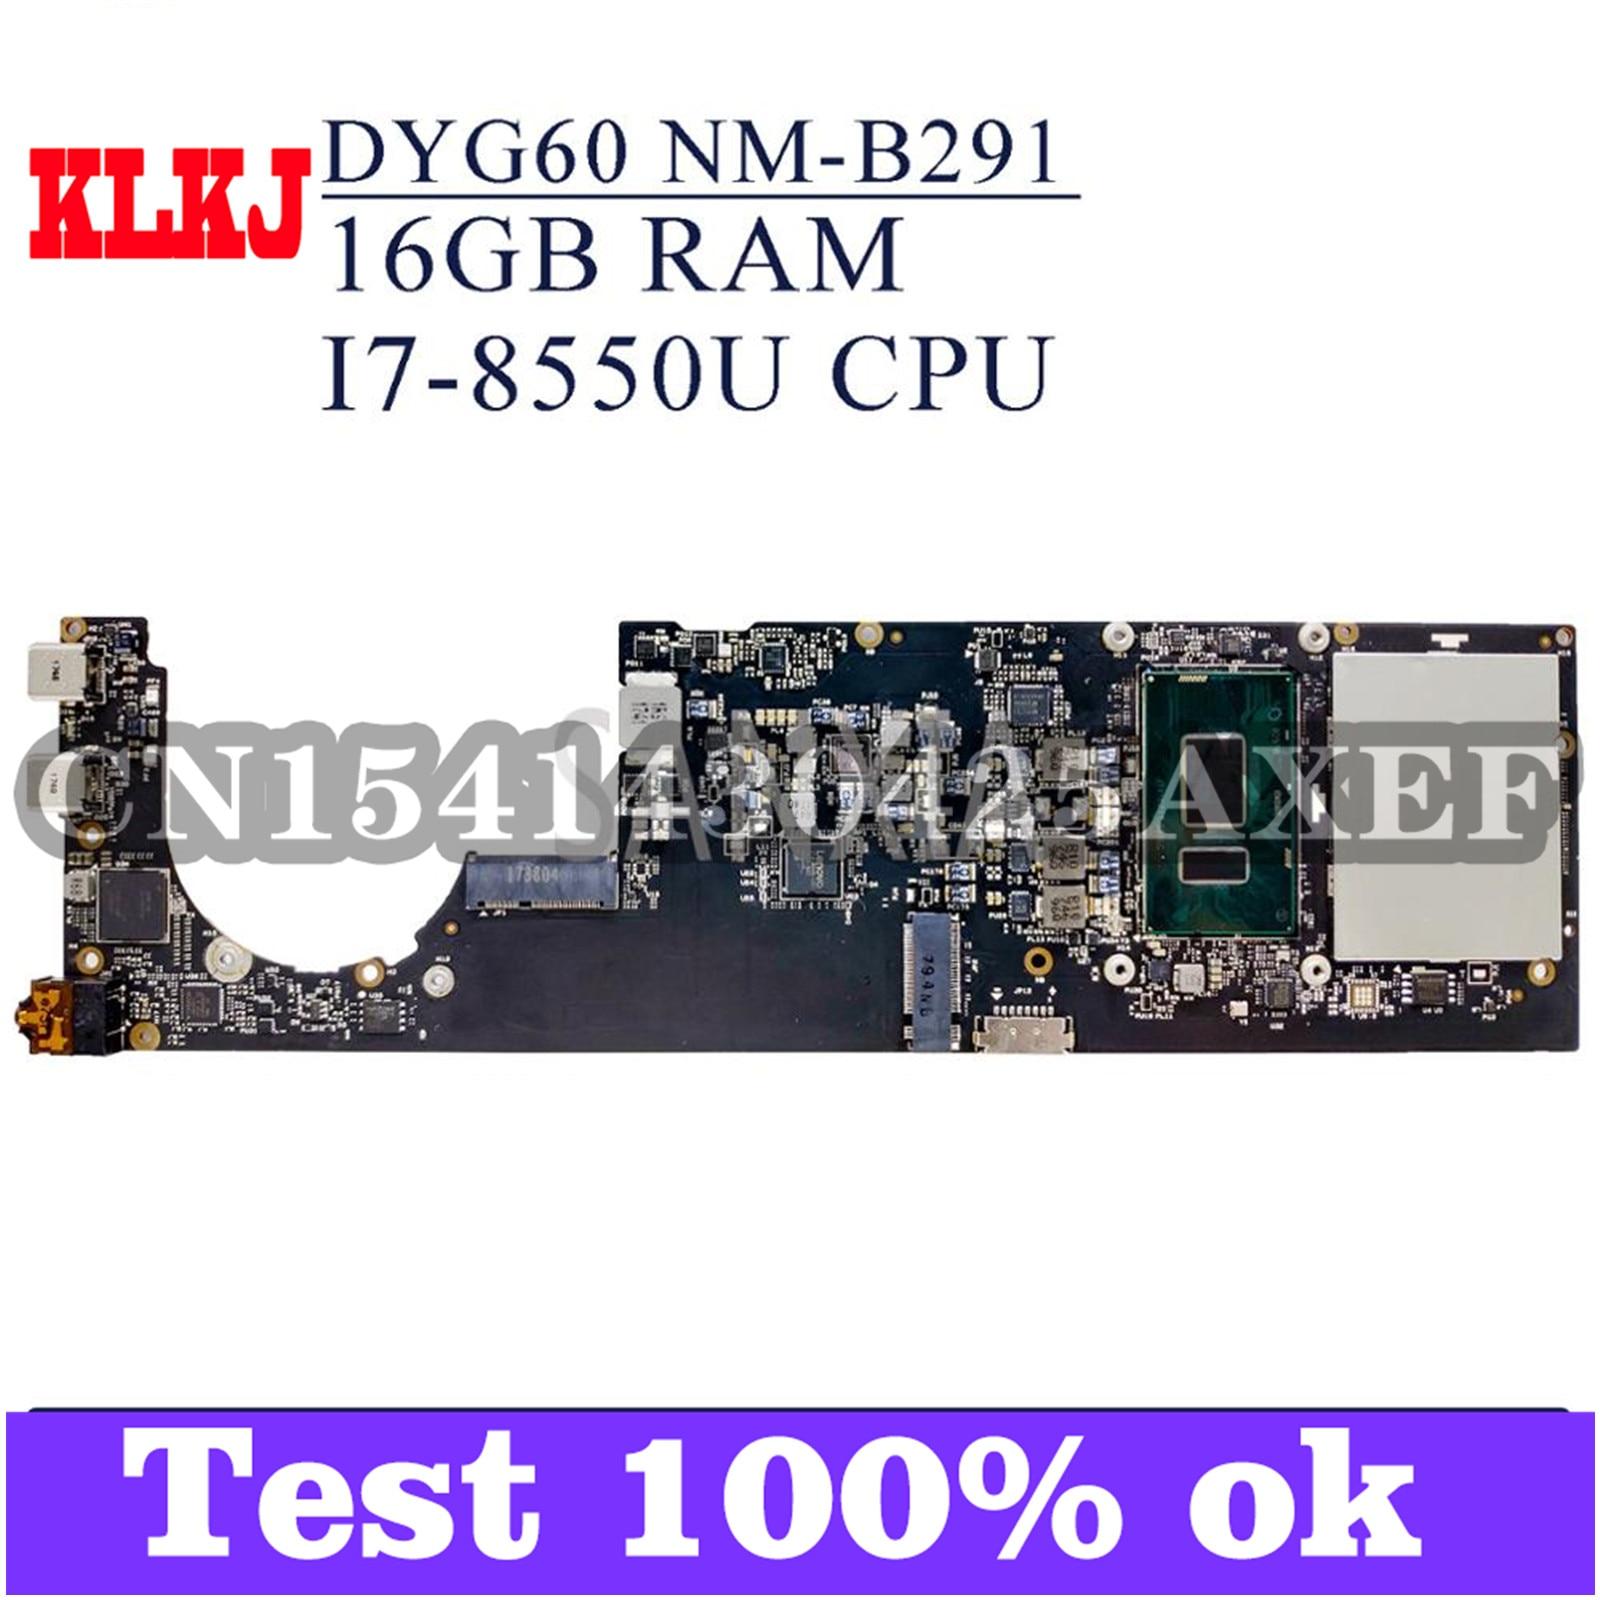 KLKJ NM-B291 اللوحة الأم للكمبيوتر المحمول لينوفو اليوغا 920-13IKB الأصلي 16GB-RAM I7-8550U